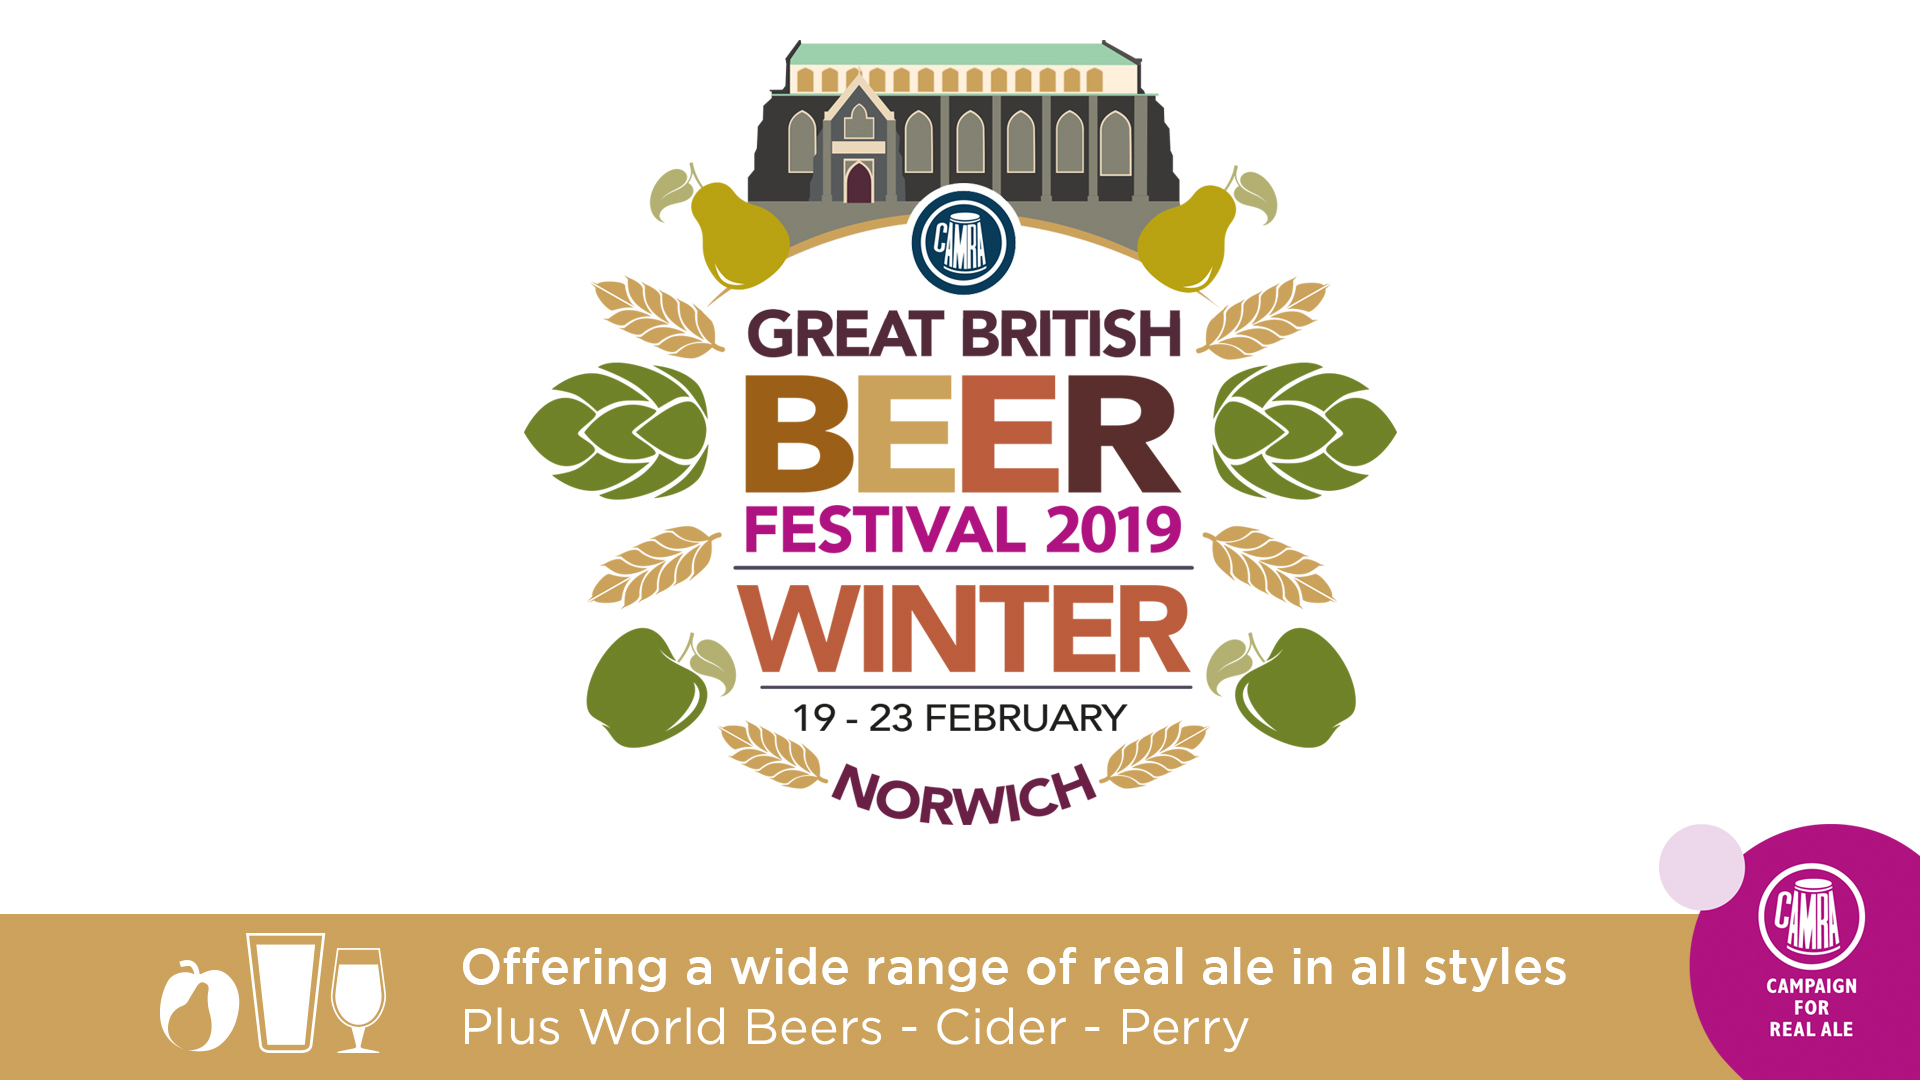 Great British Beer Festival Winter